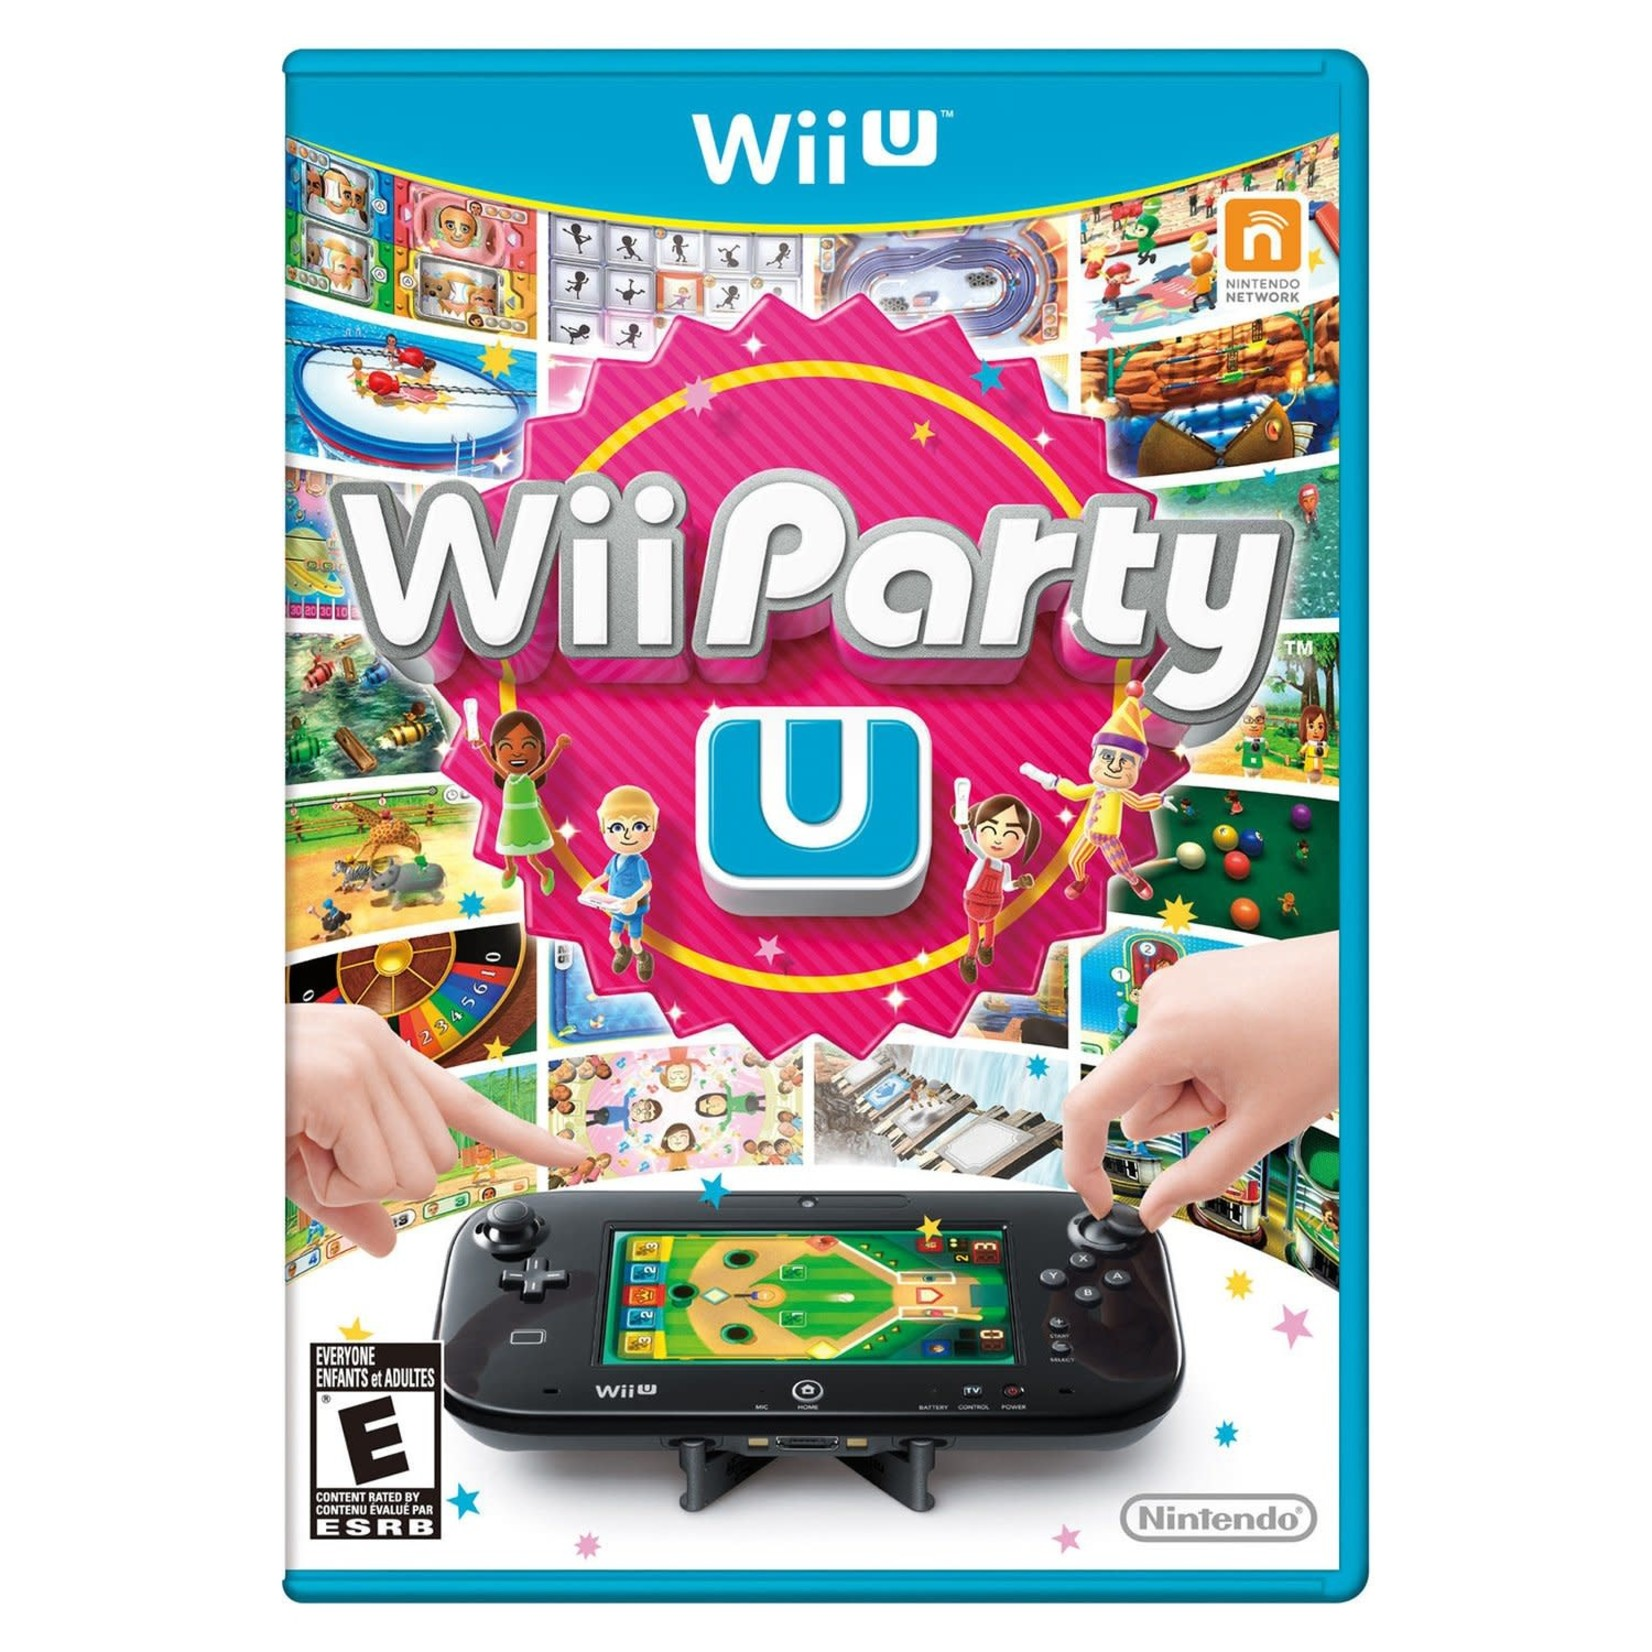 wiiuusd-Wii Party U